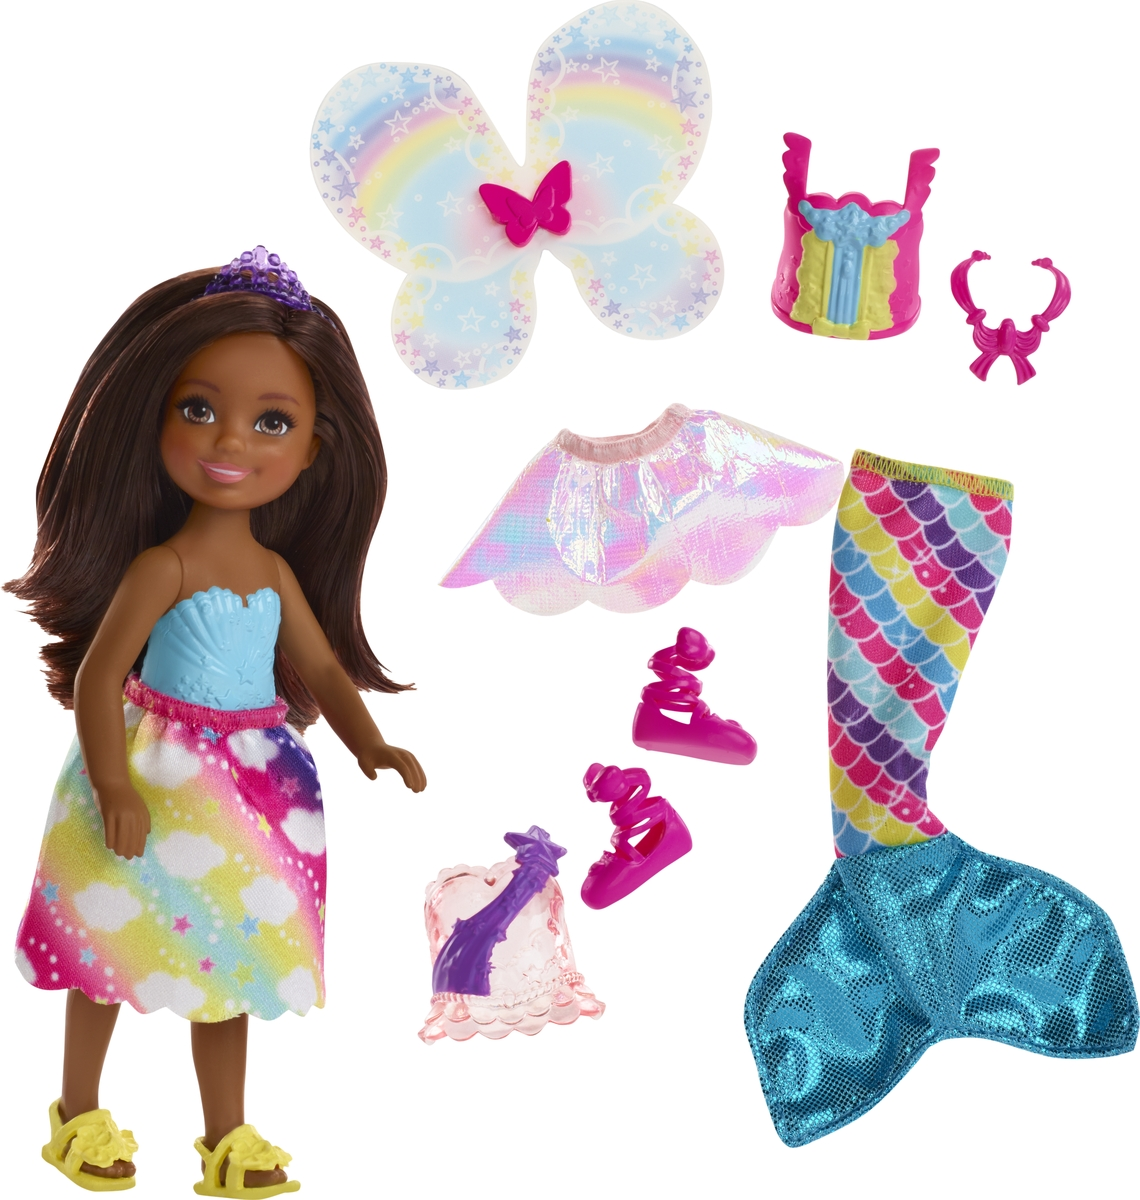 Barbie Кукла Челси фея русалка FJC99_FJD01 цены